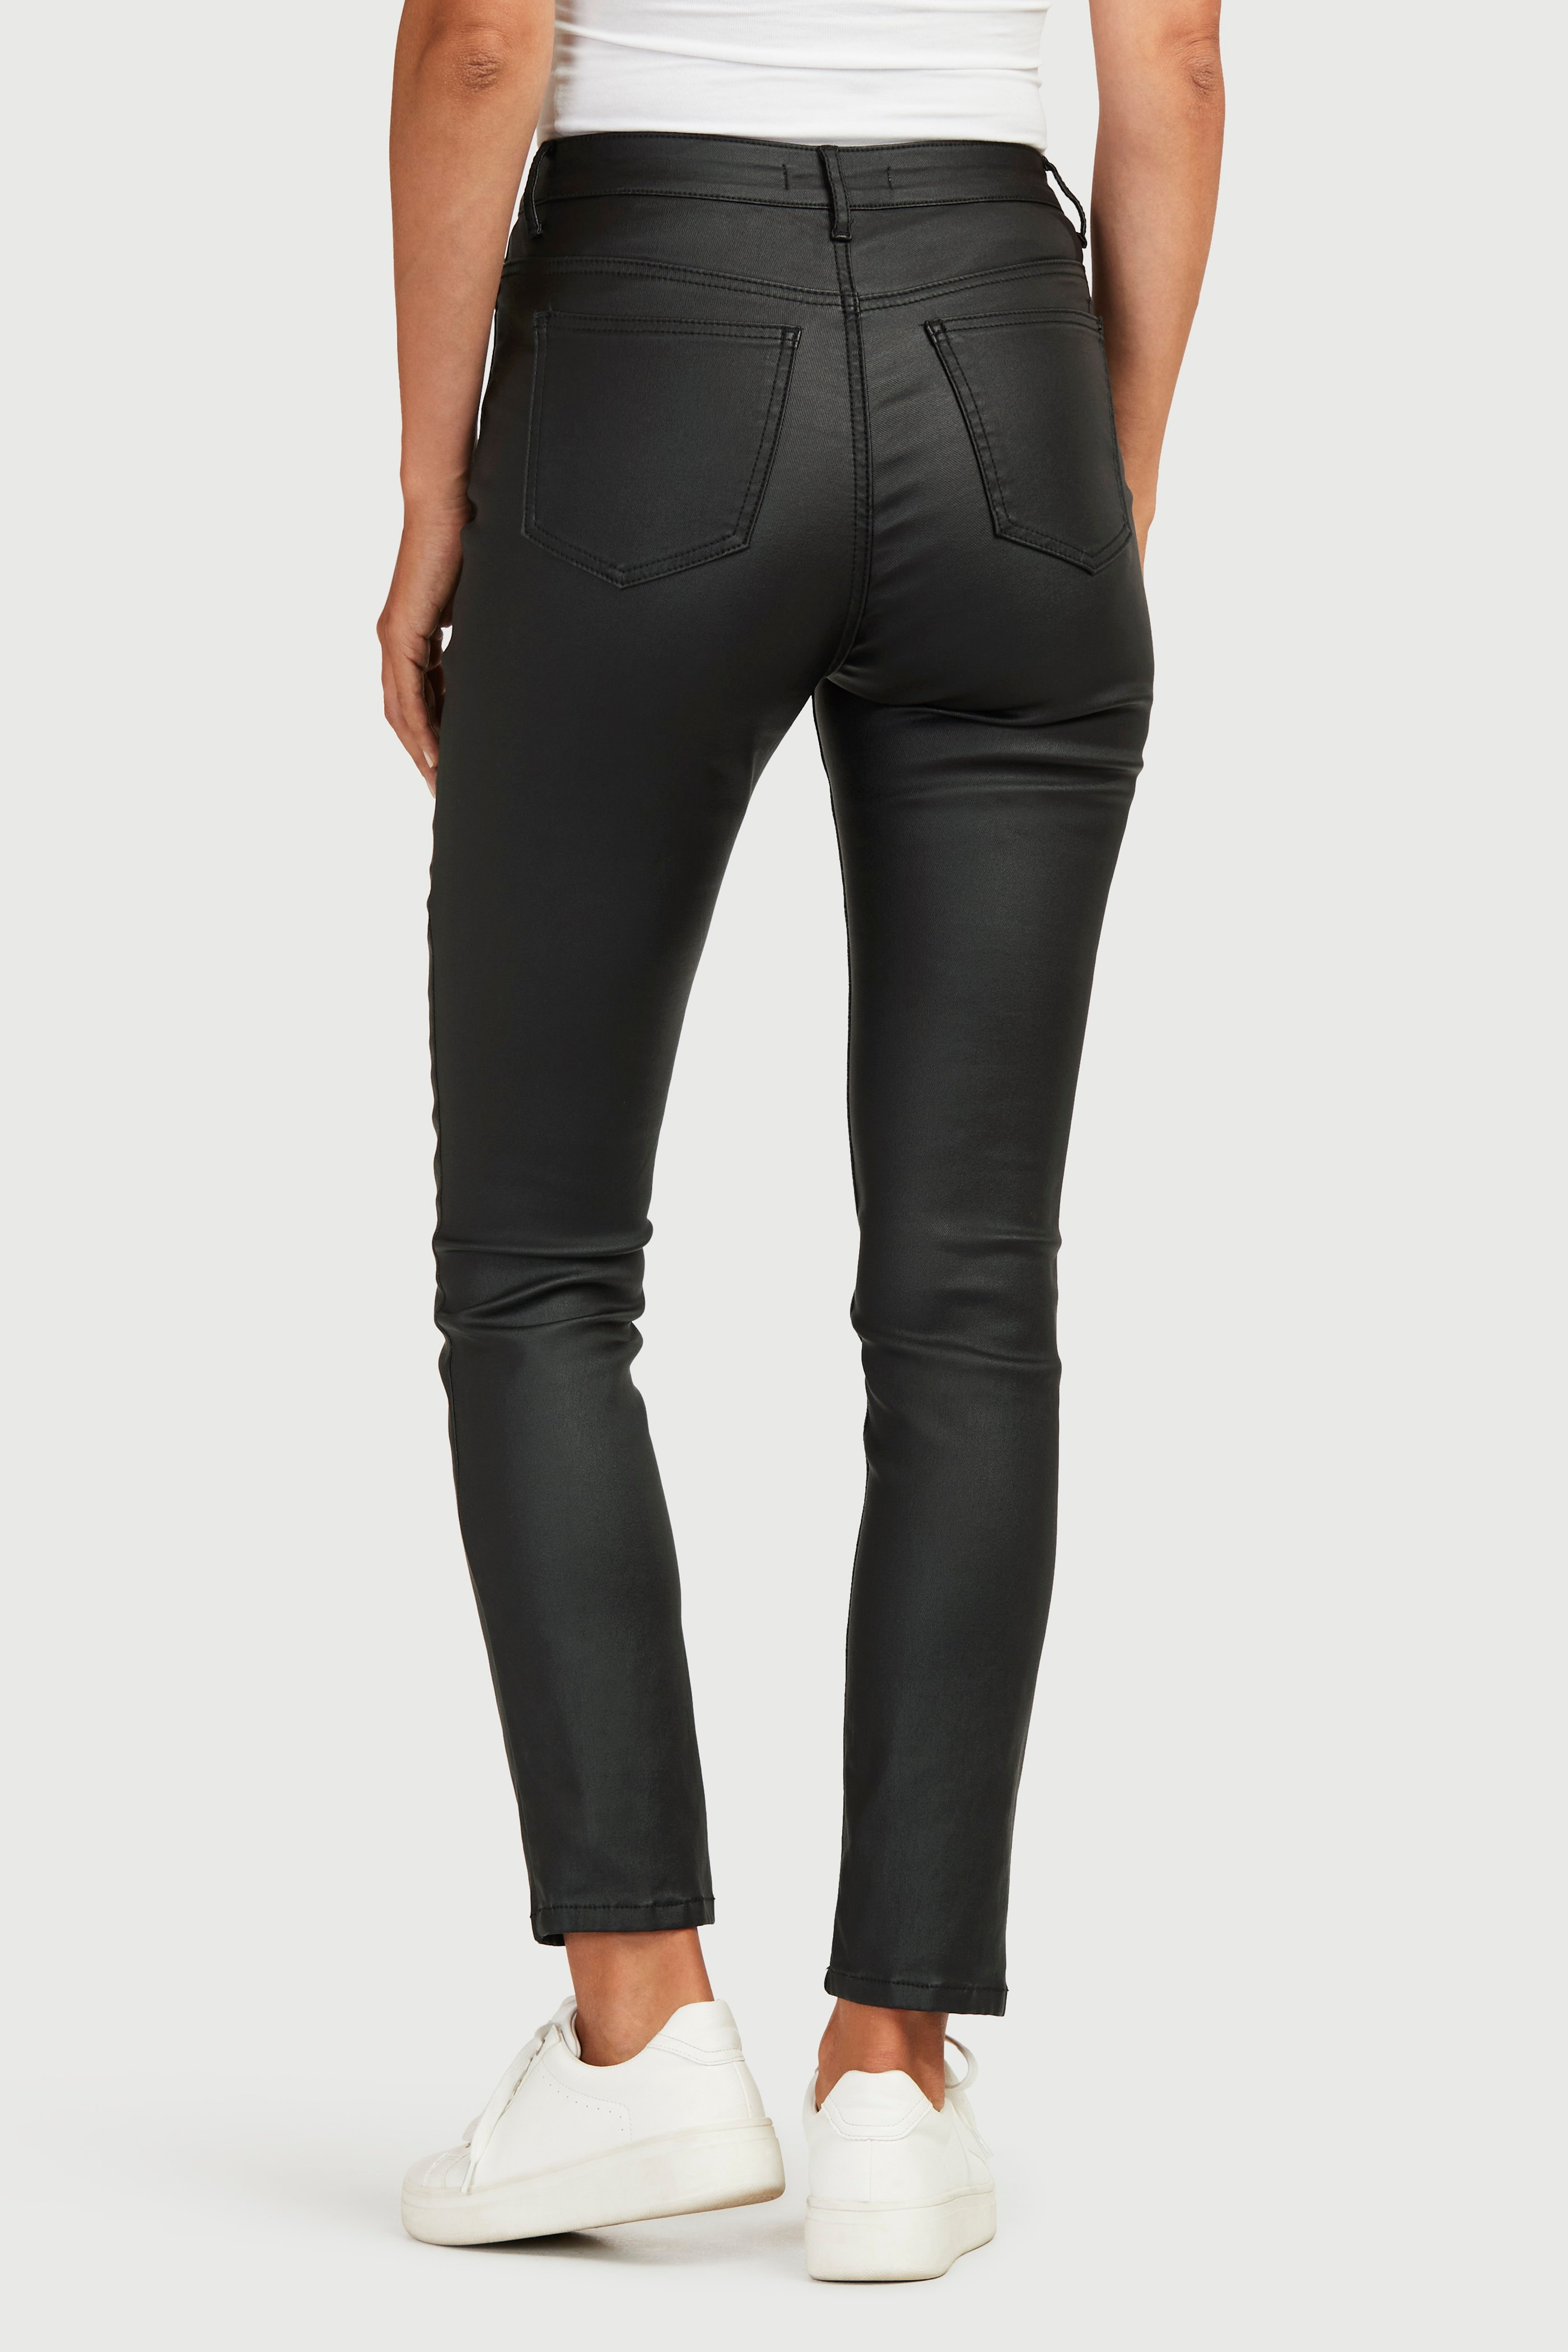 Superelastisk bukse med vokset overflate